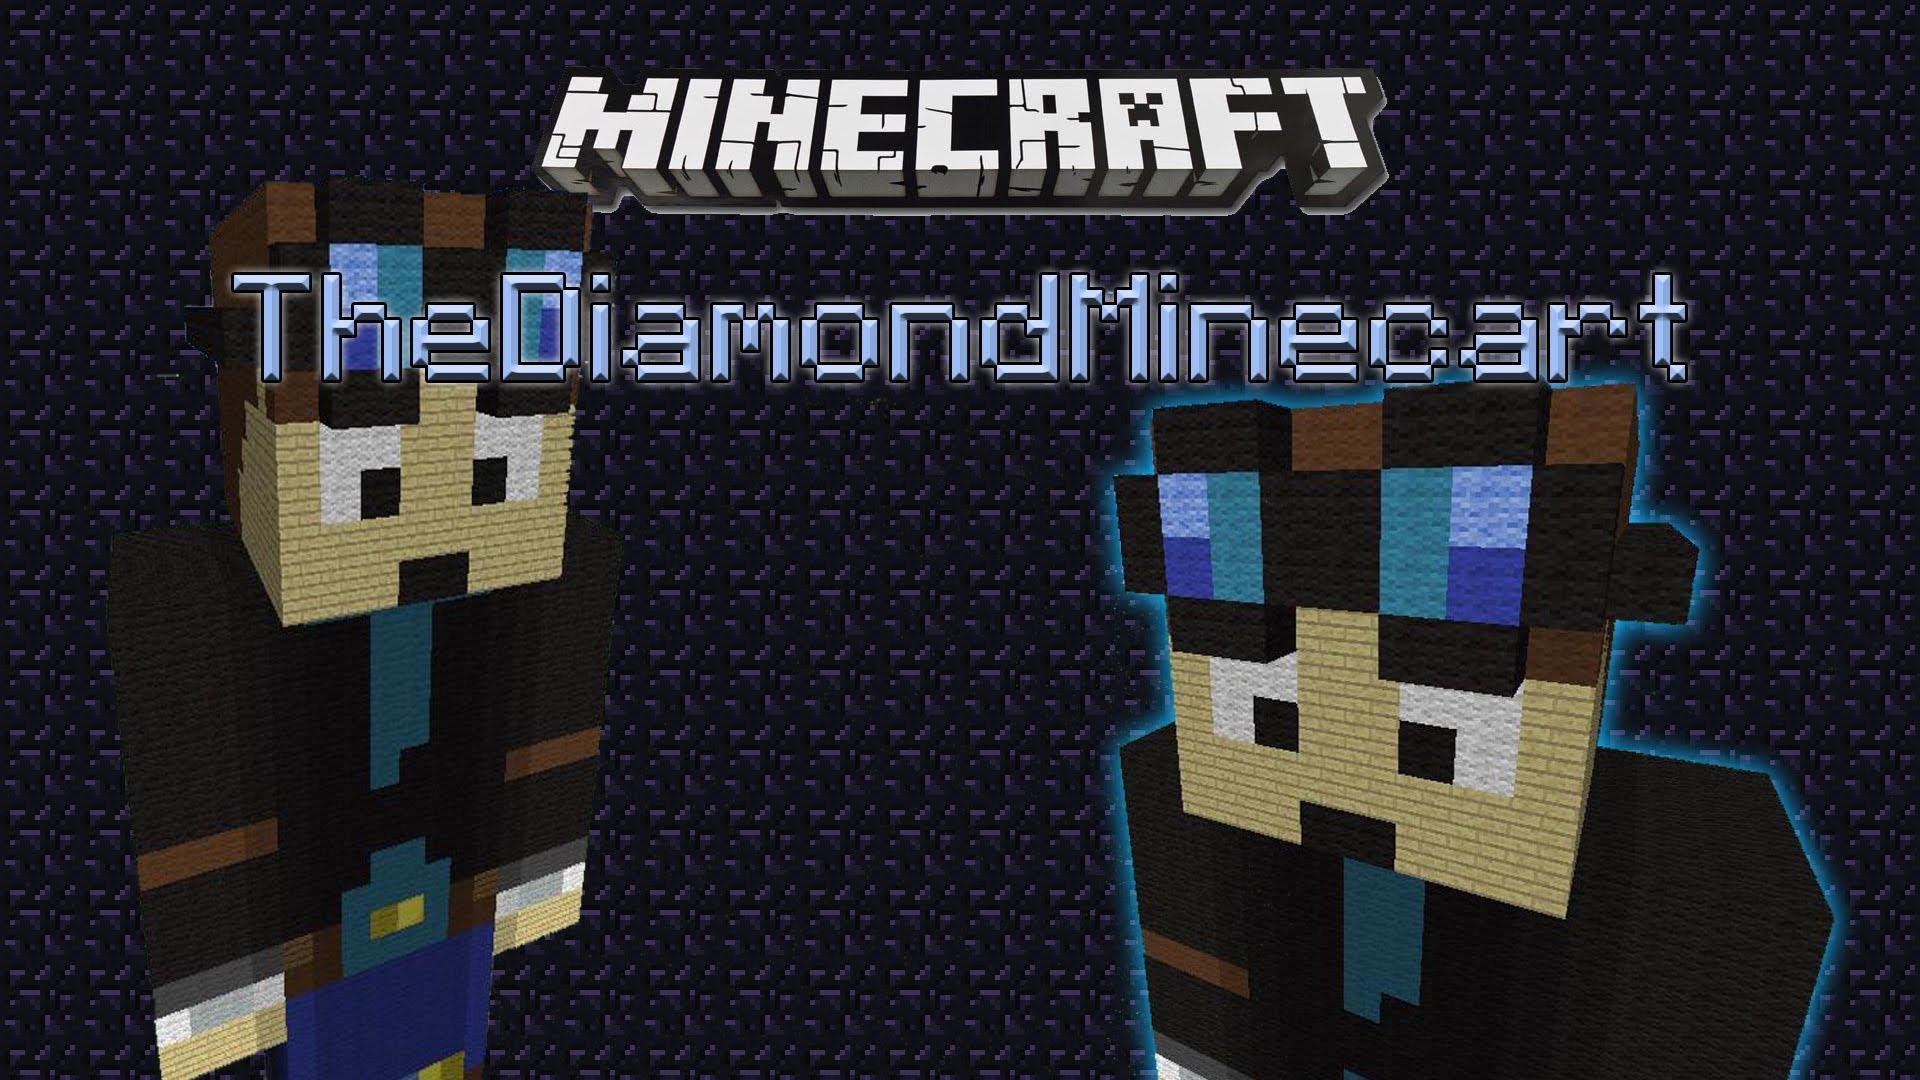 MineHouse 1 DanTDM aka TheDiamondMinecart 1920x1080